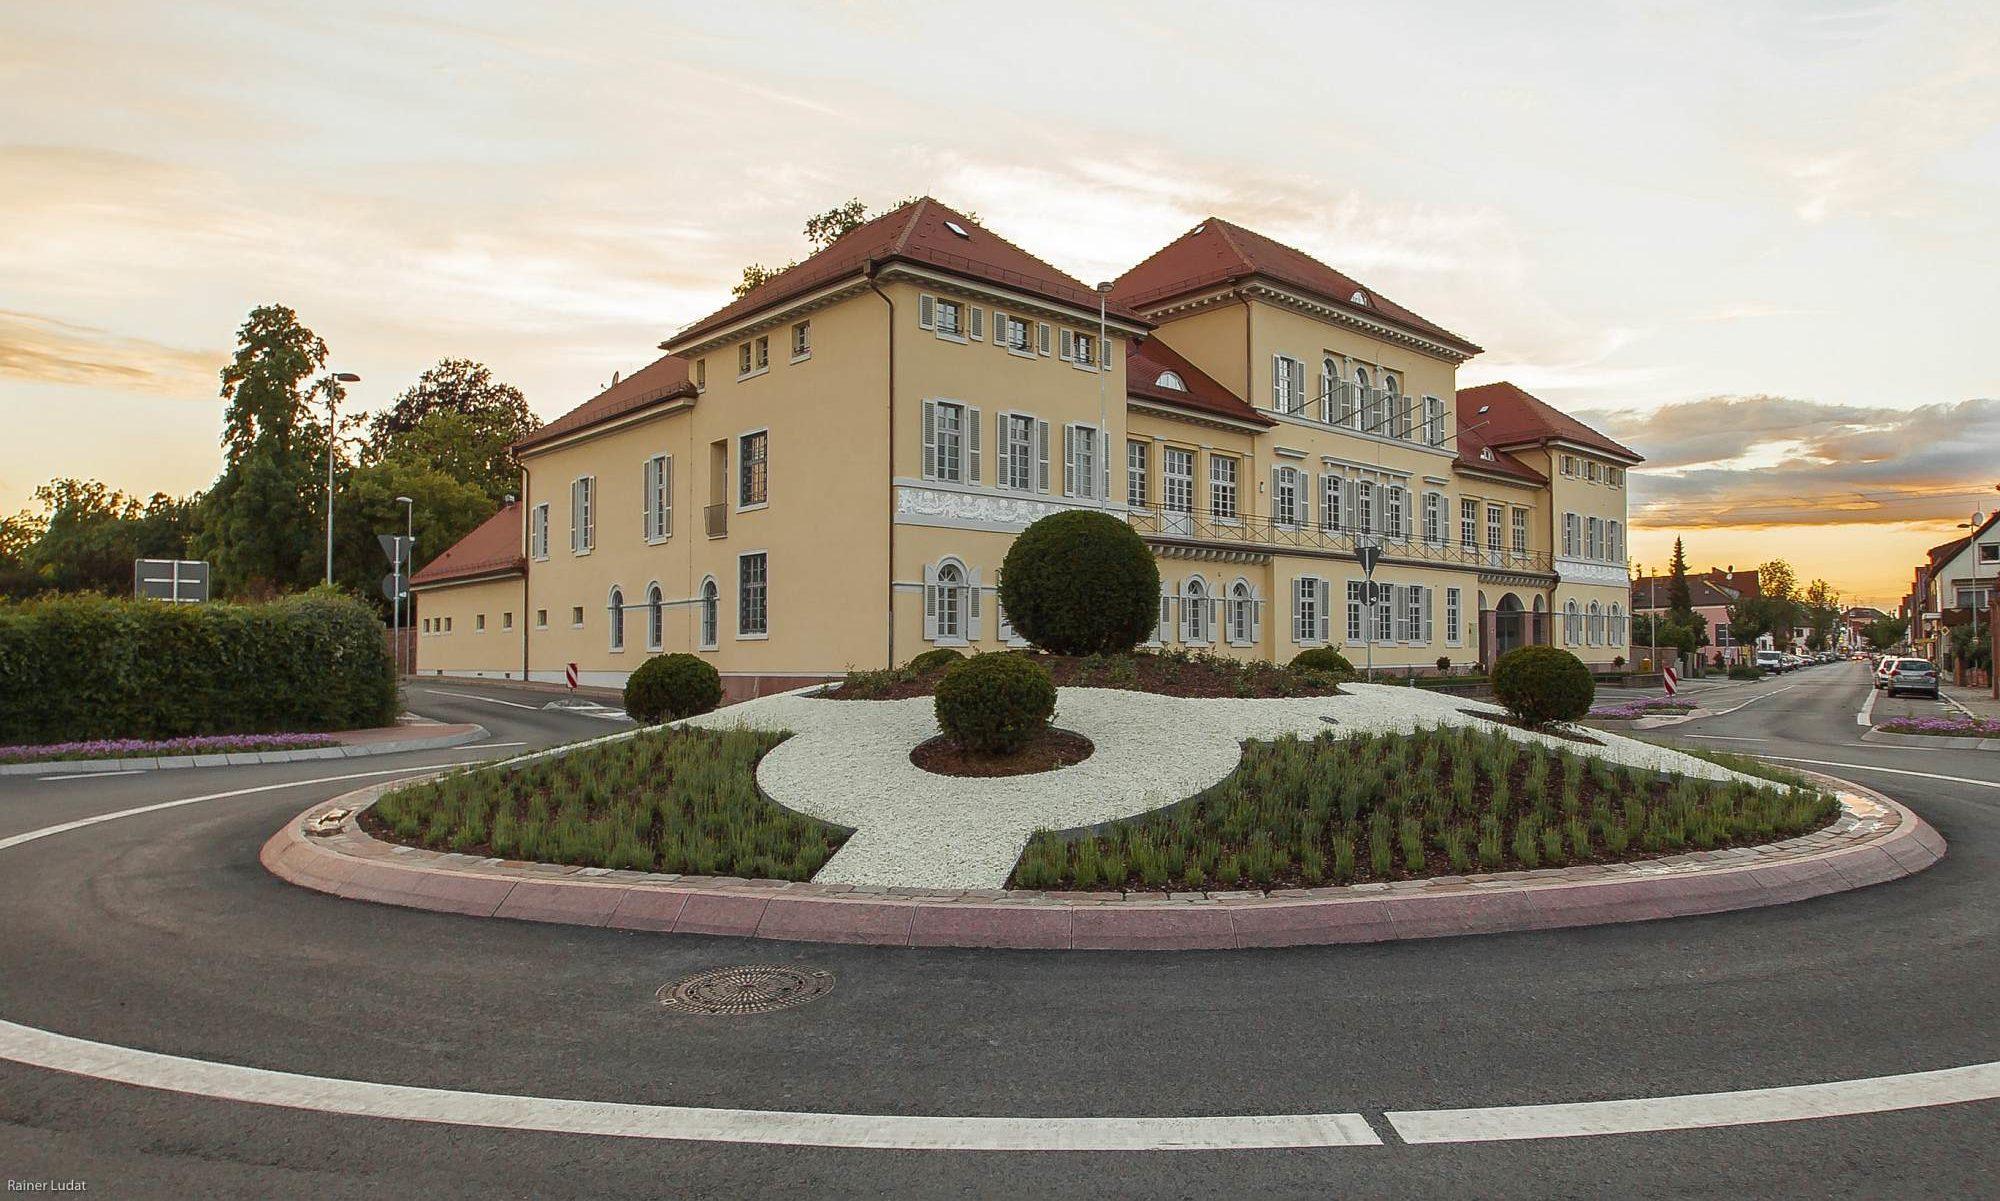 Fotogruppe Edingen-Neckarhausen